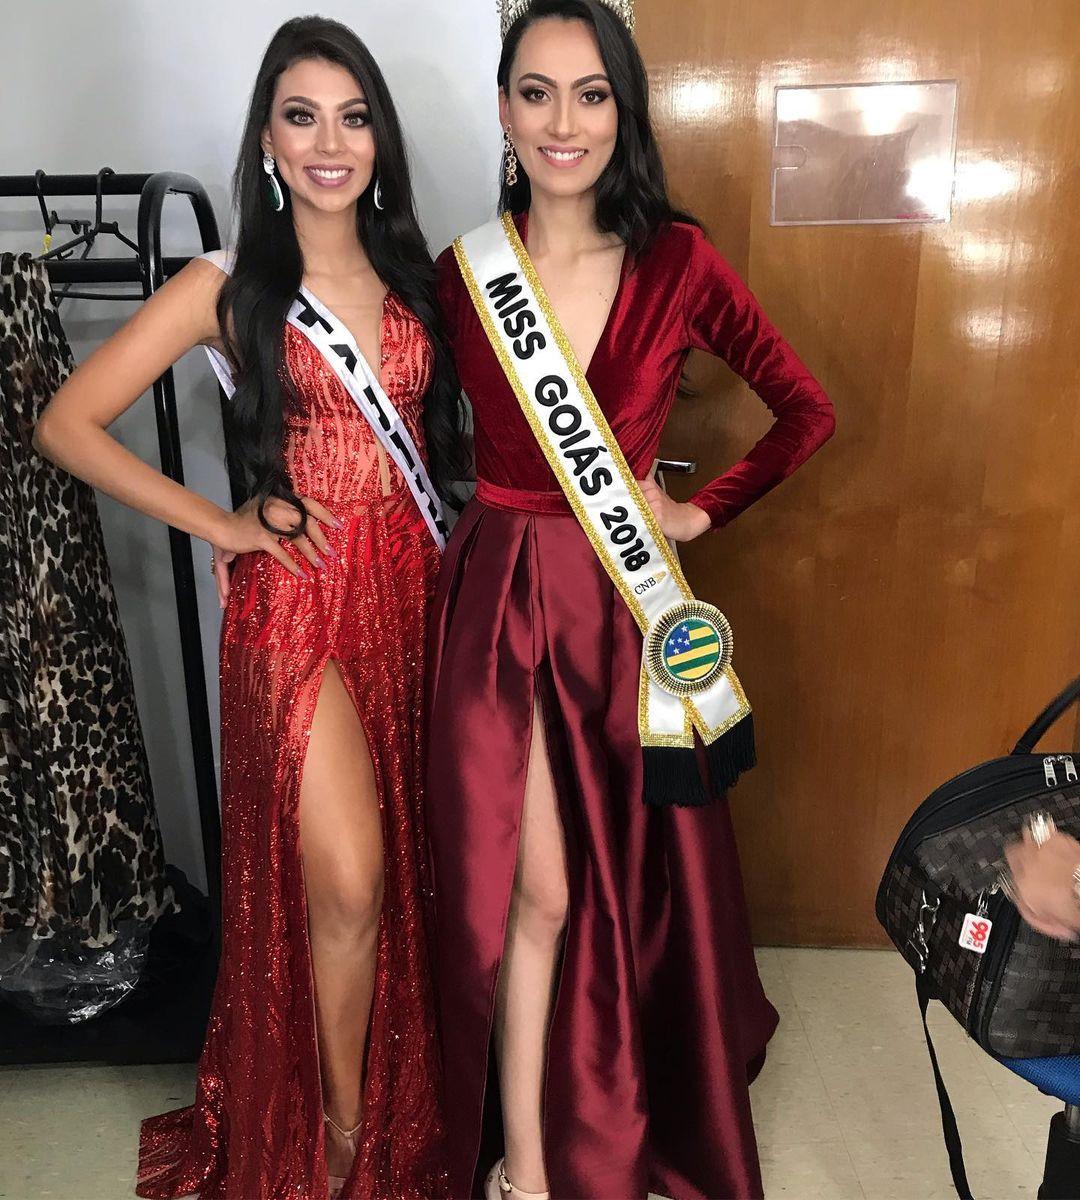 julia alves, miss cerrado goiano mundo 2019. - Página 4 Fumk9j10